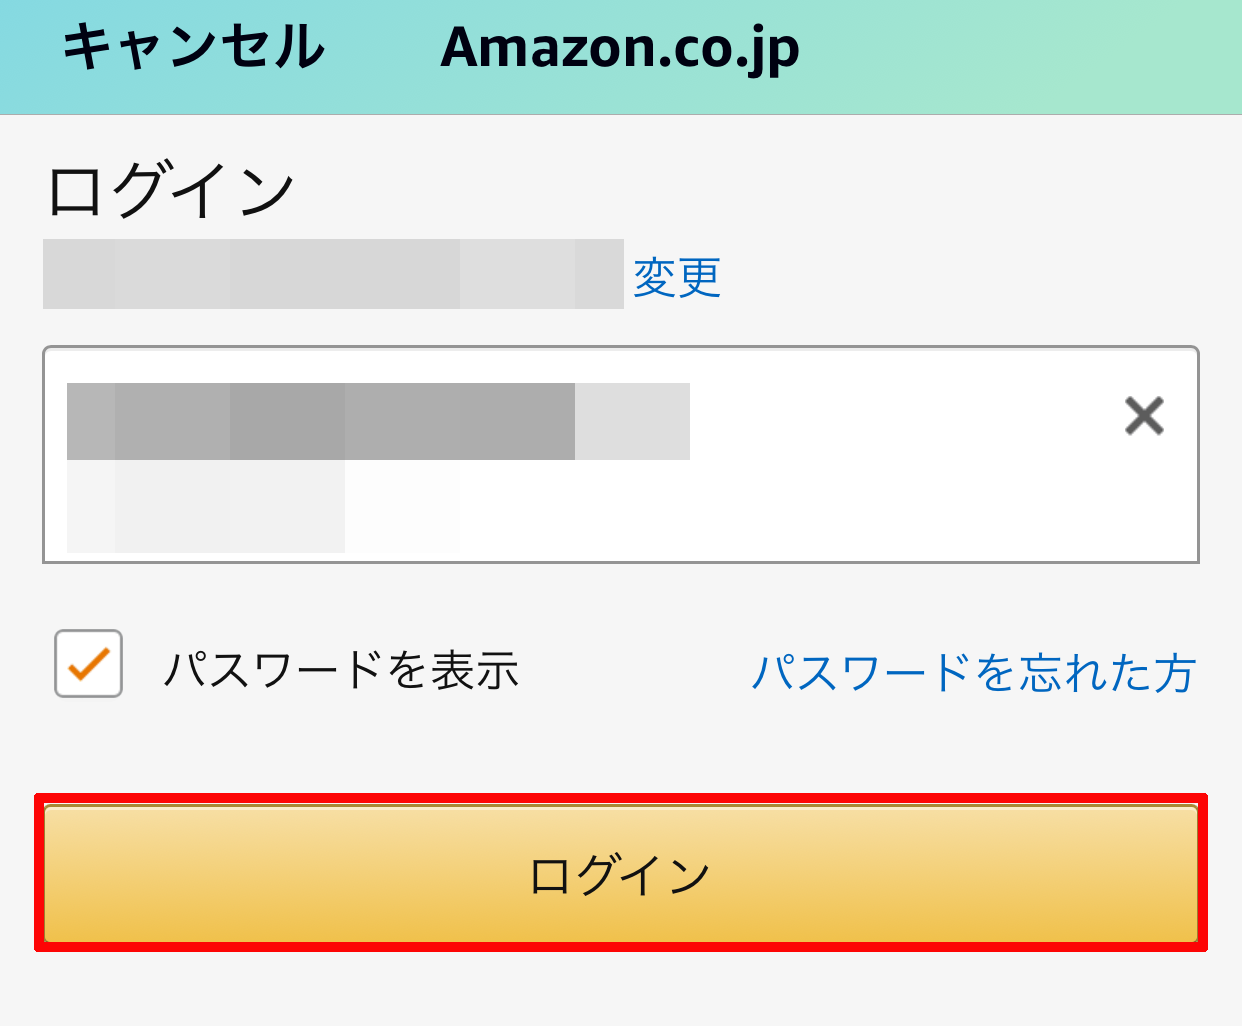 ①Amazonのアプリを起動し、ご自身のアカウントへログインをする